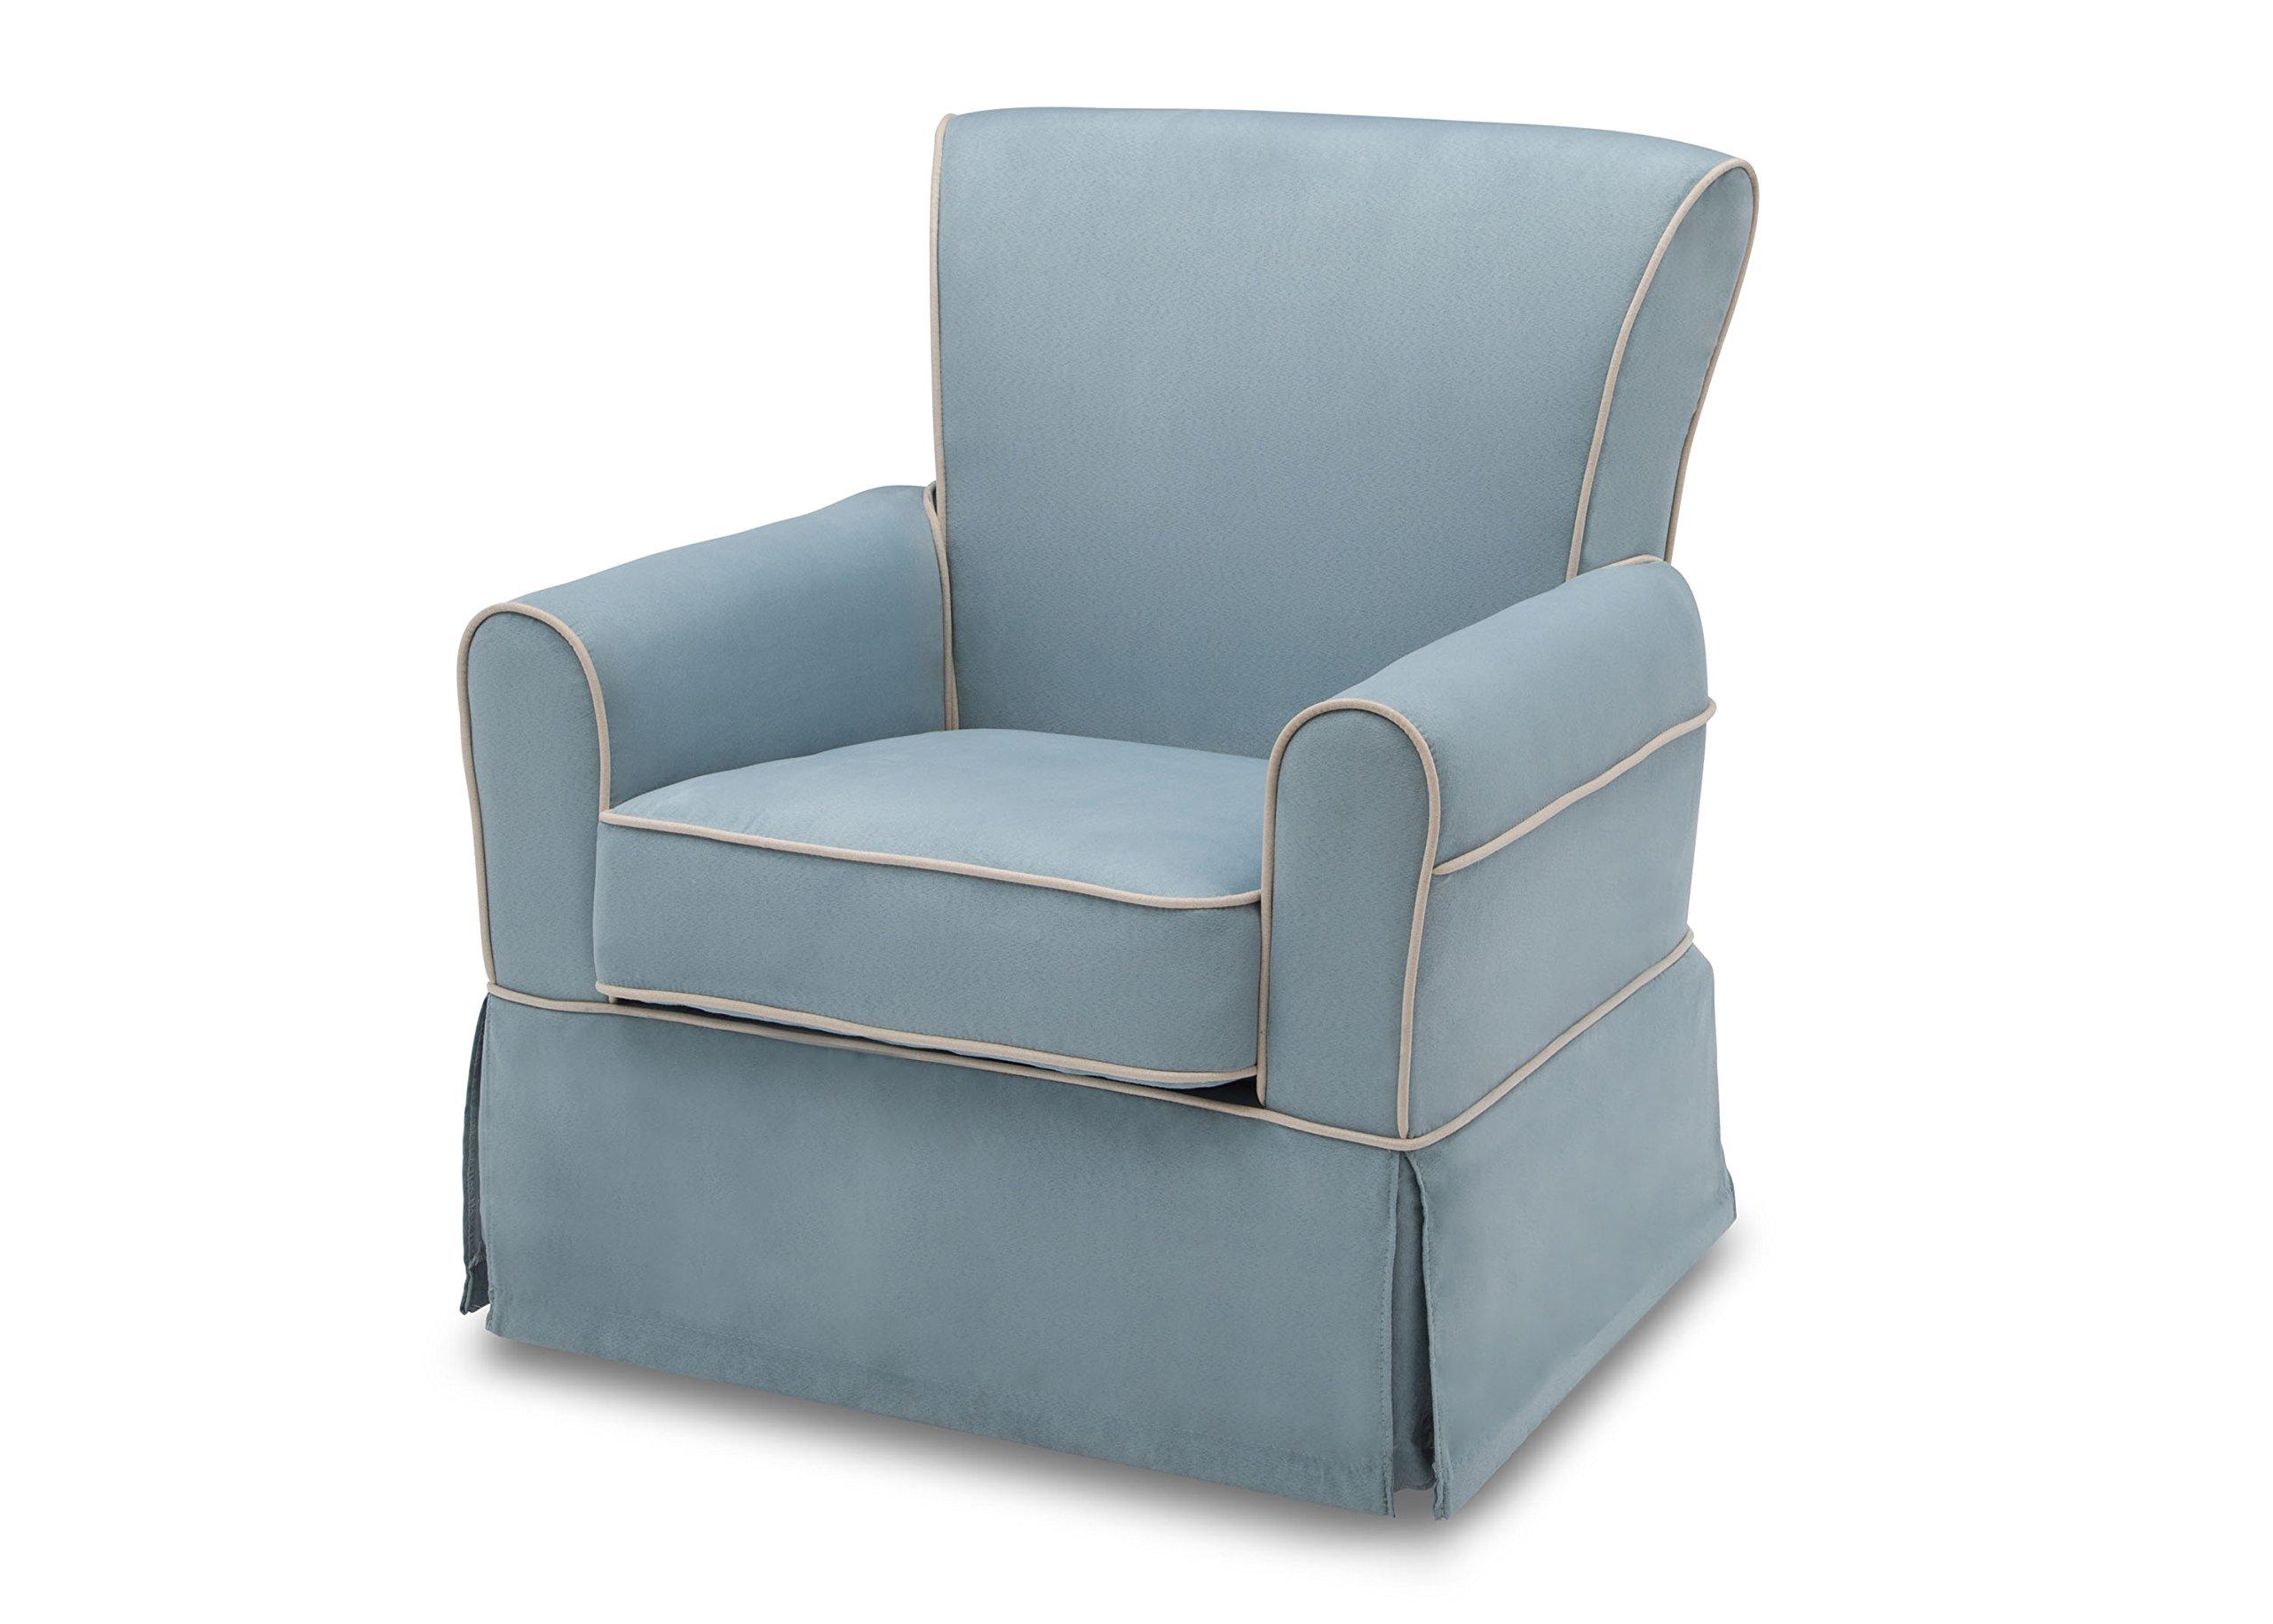 Delta Furniture Benbridge Upholstered Glider Swivel Rocker Chair, Frozen Blue with Cream Welt by Delta Furniture (Image #1)